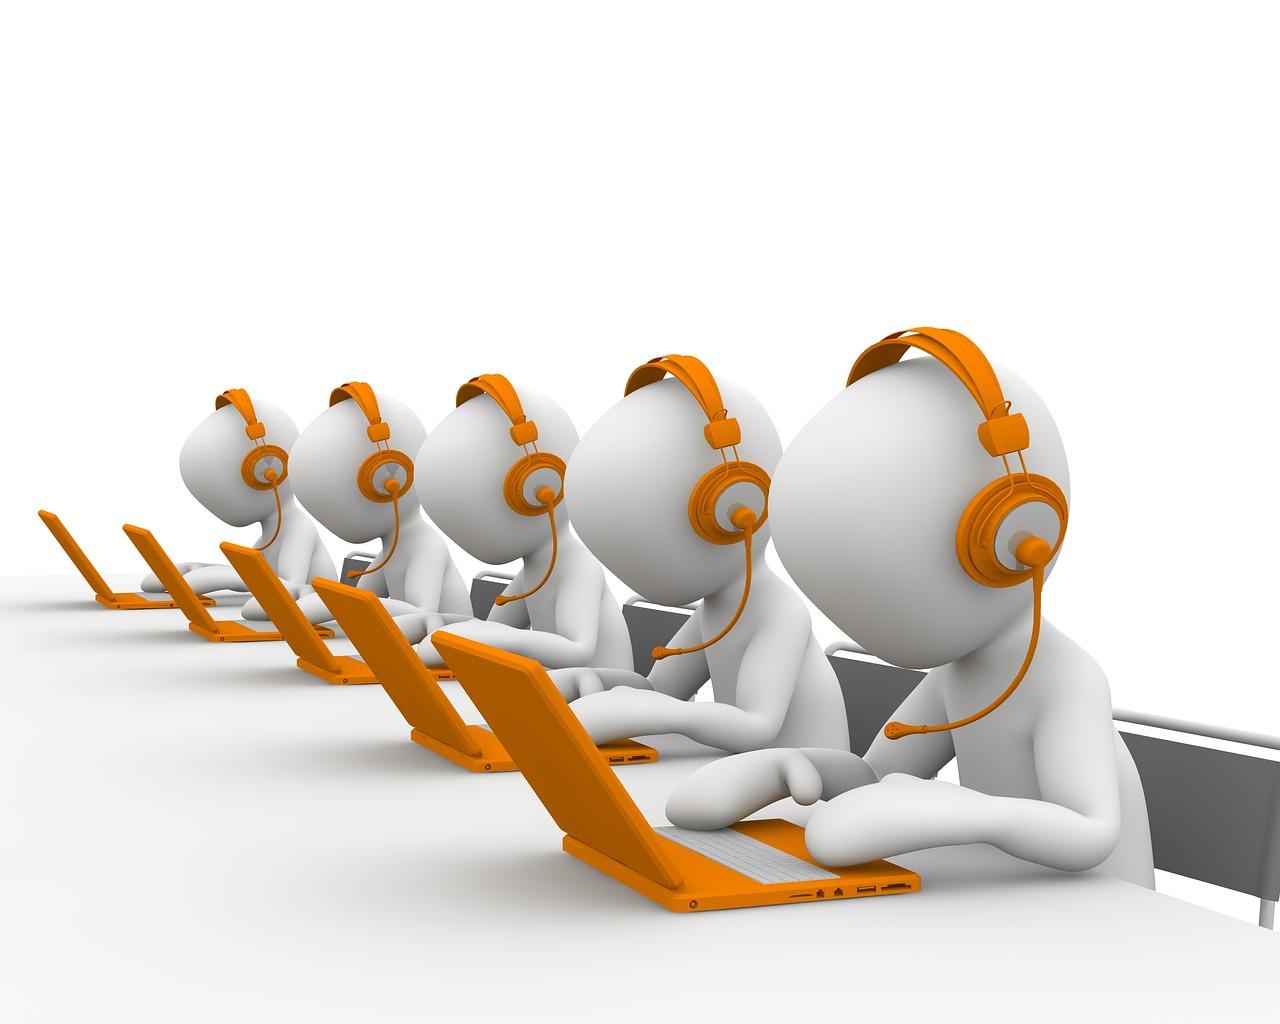 Area Code 222 Scam Calls - One Ring or Wangiri Robocalls